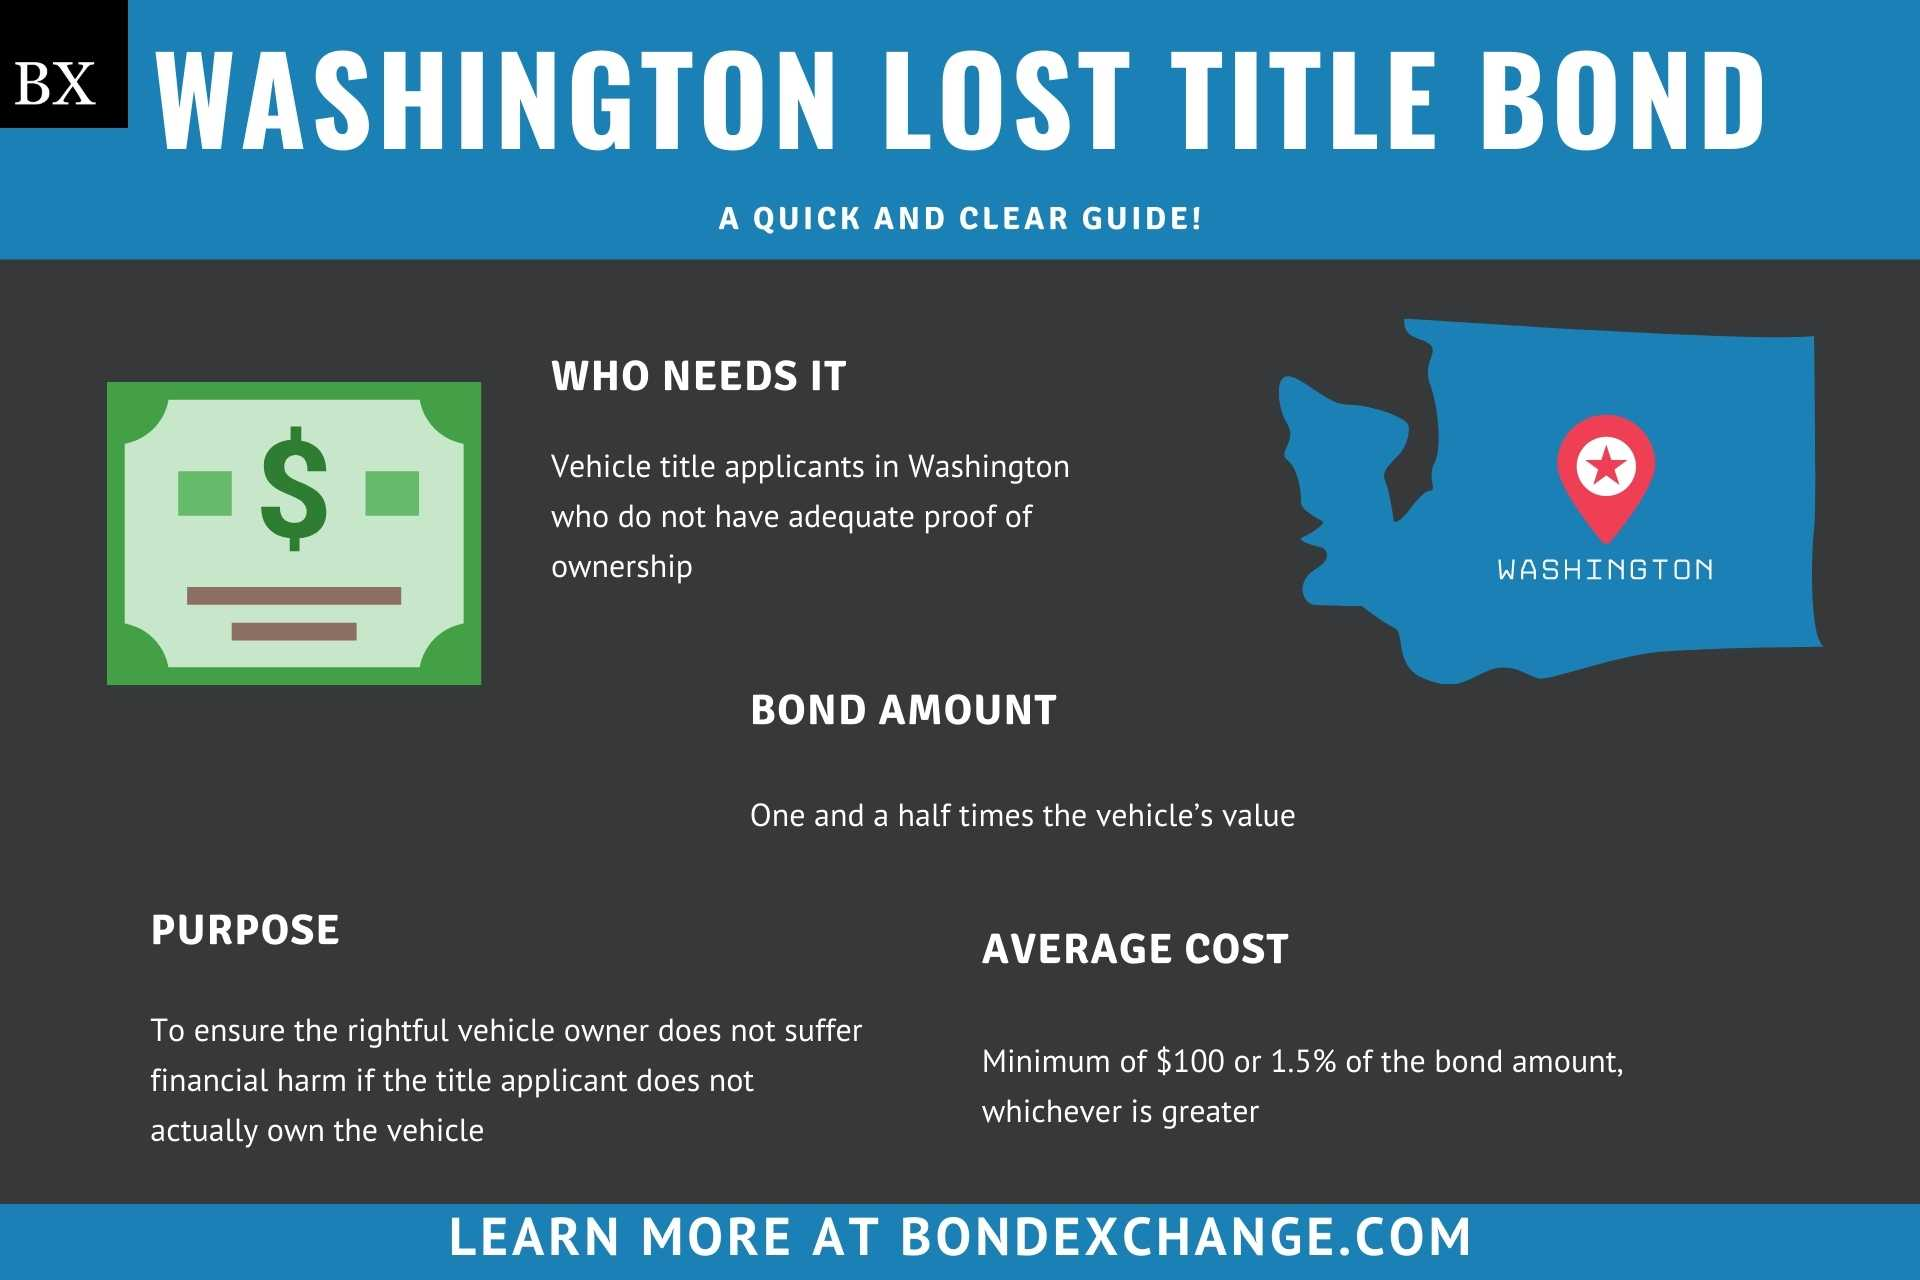 Washington Lost Title Bond